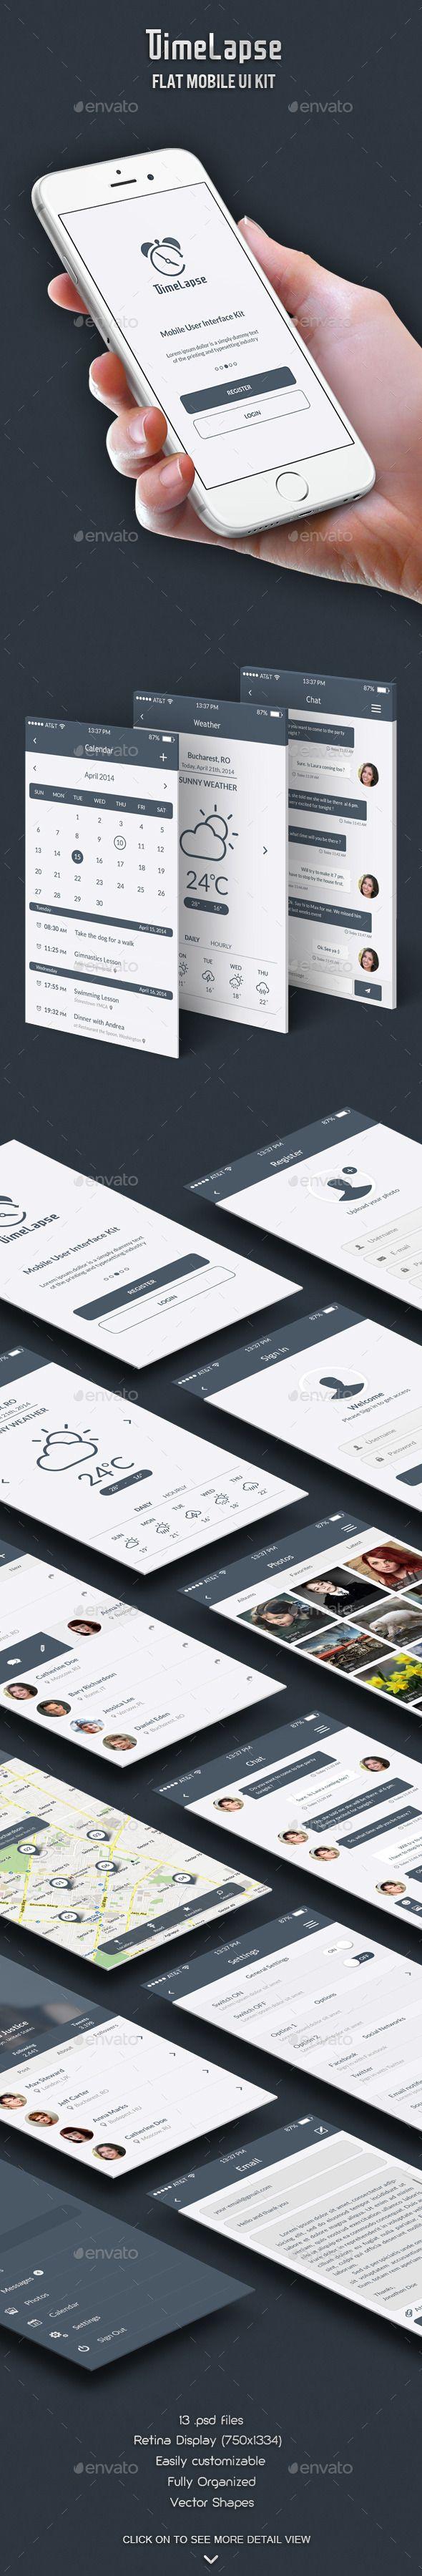 Timelapse - Flat Mobile UI Kit